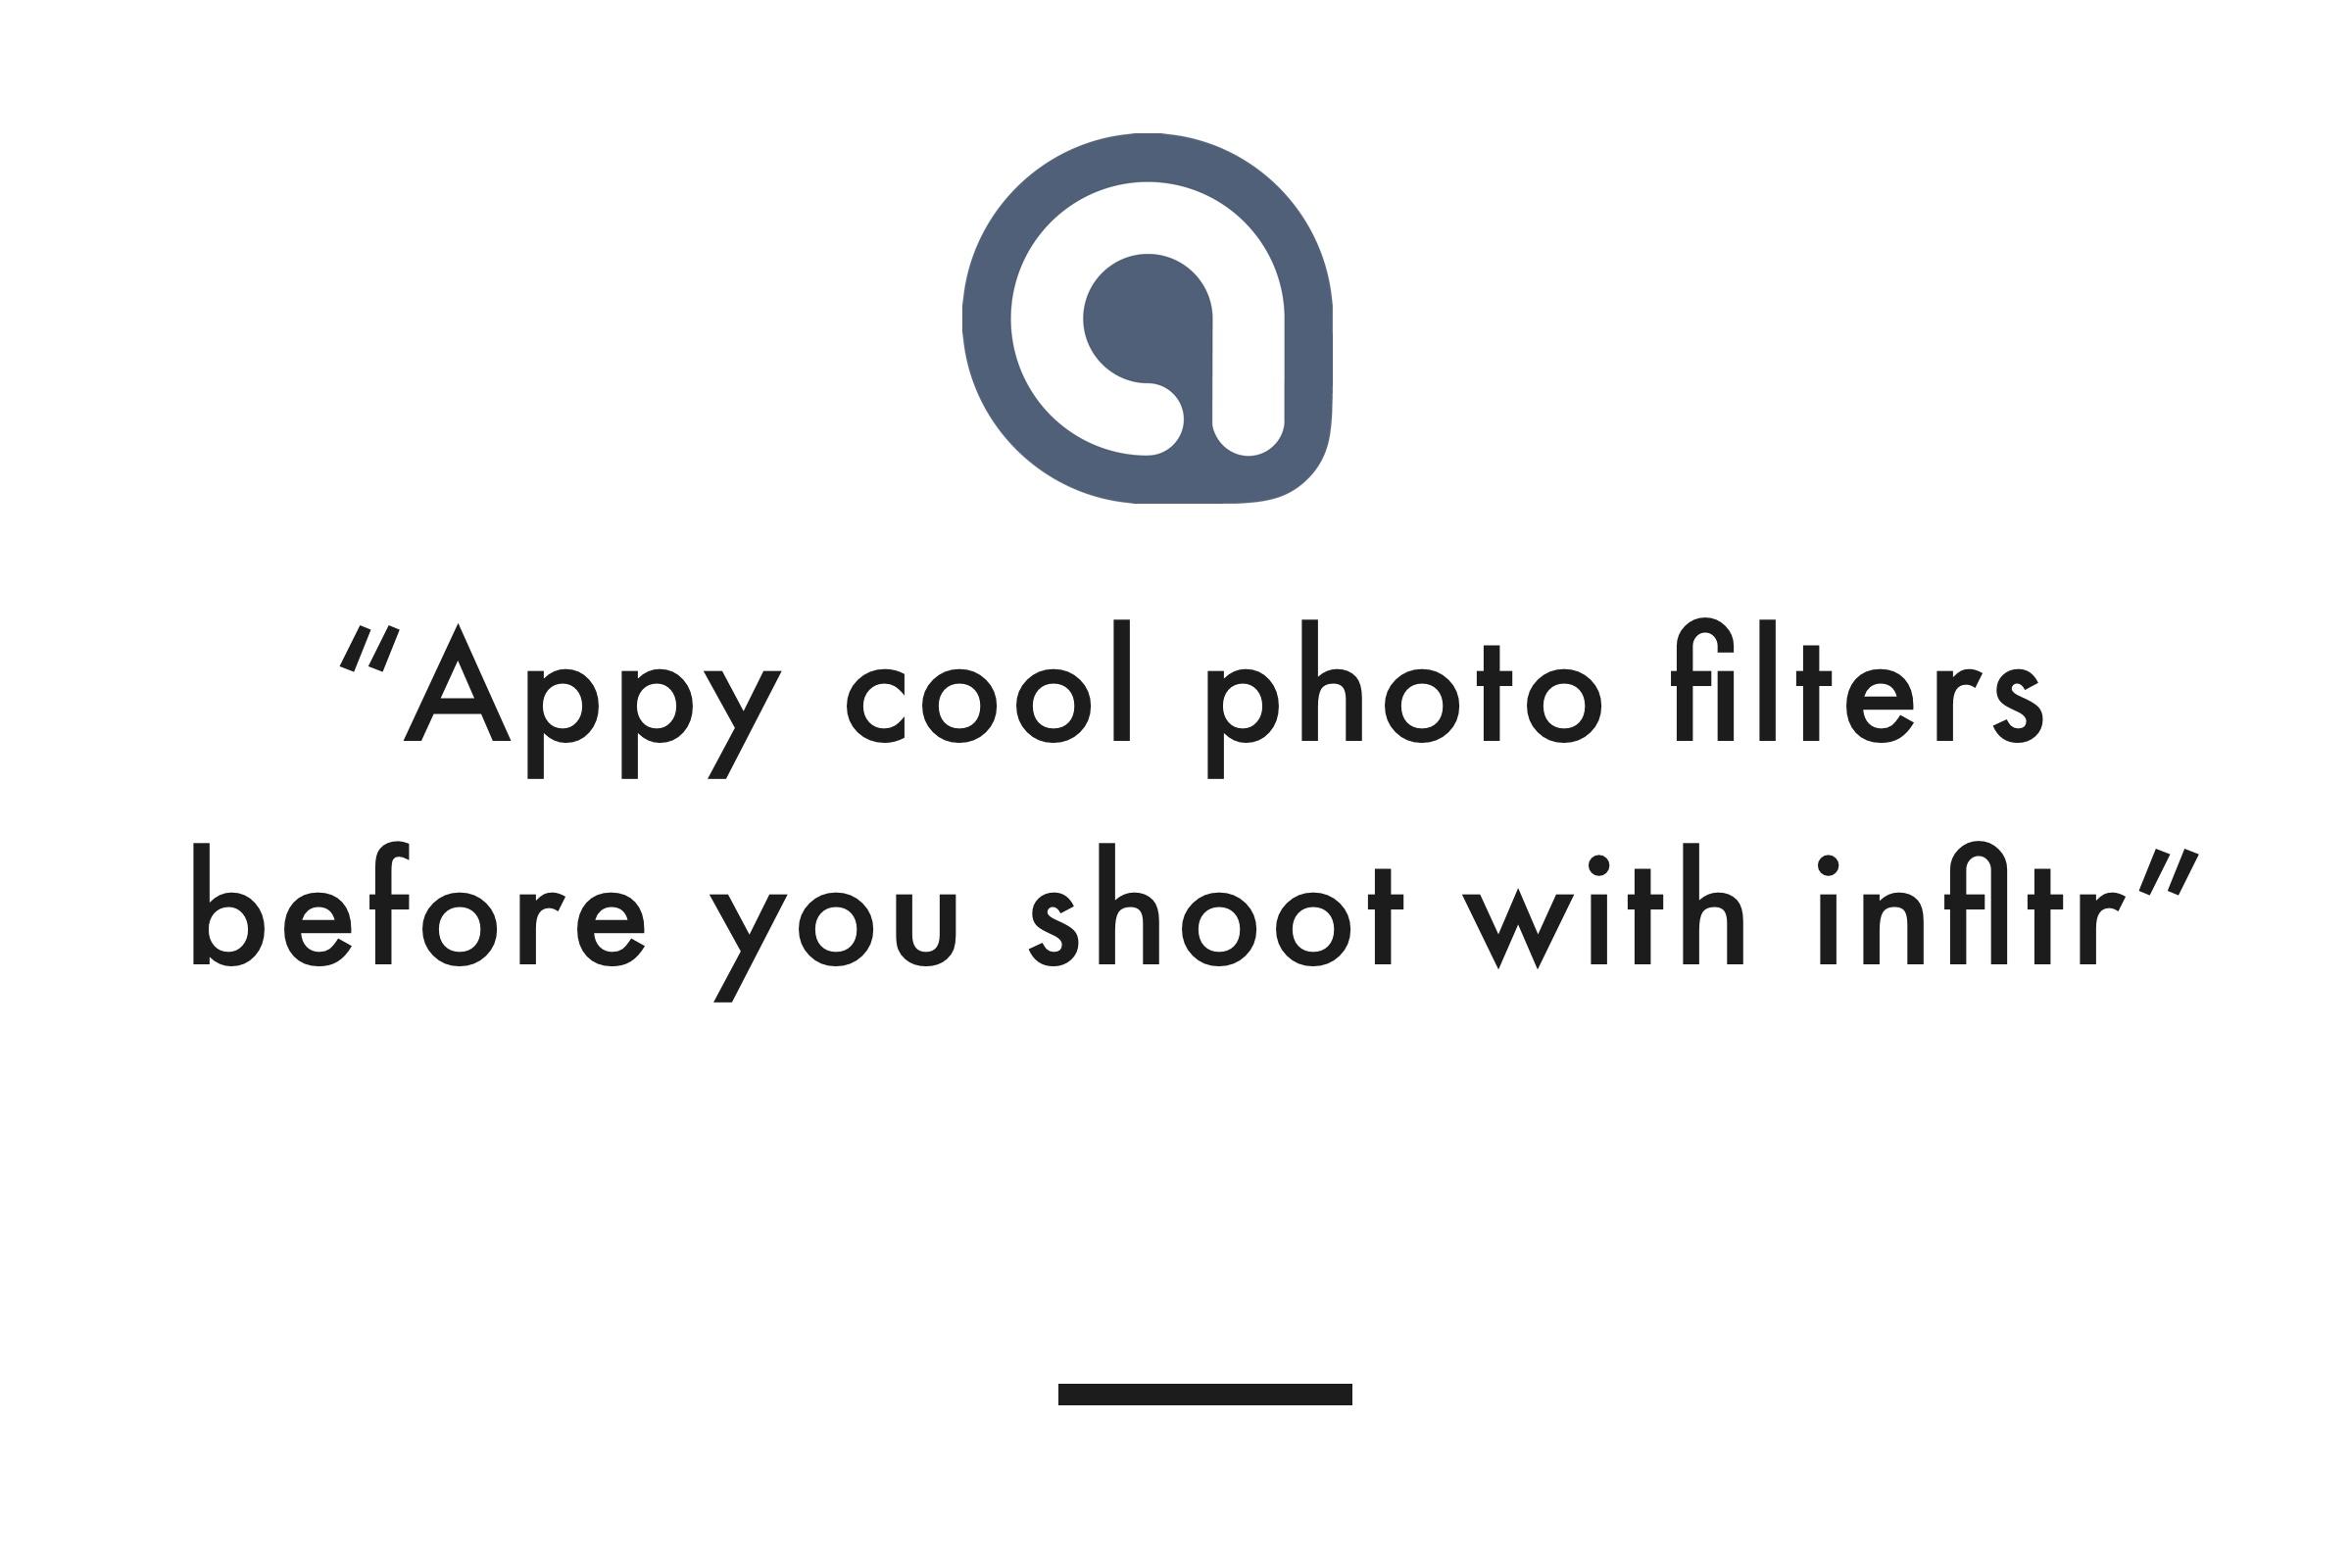 app advice infltr